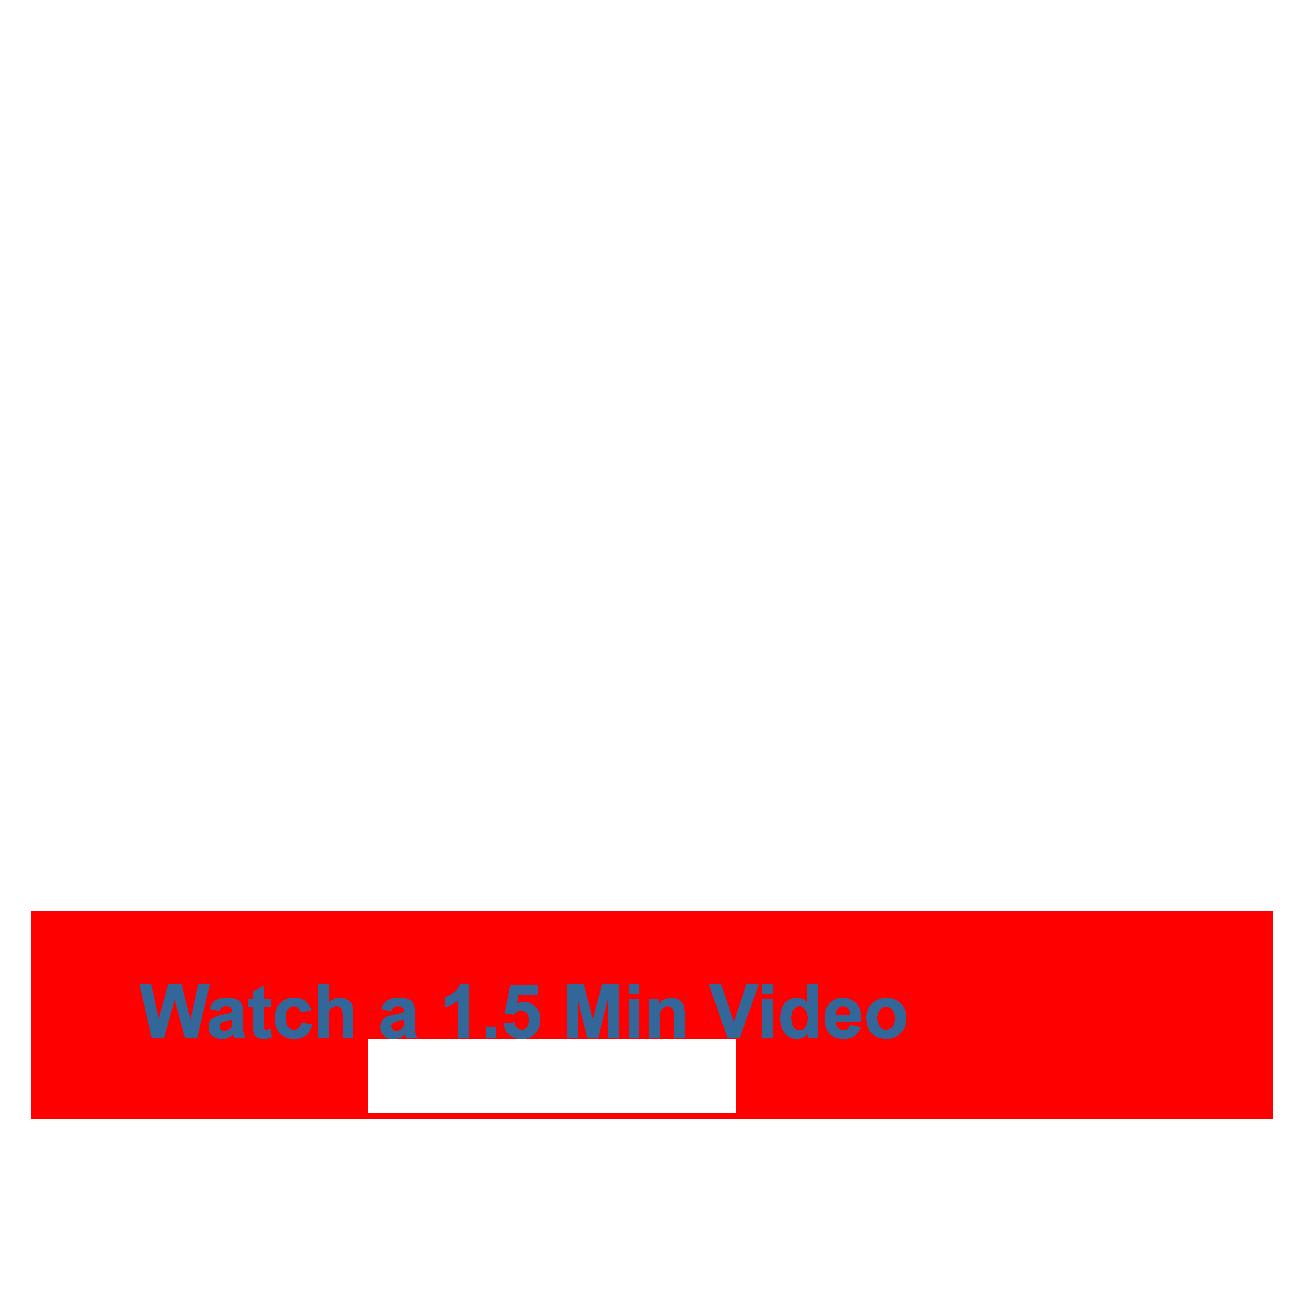 Home-Page-Desktop-Video-1.png